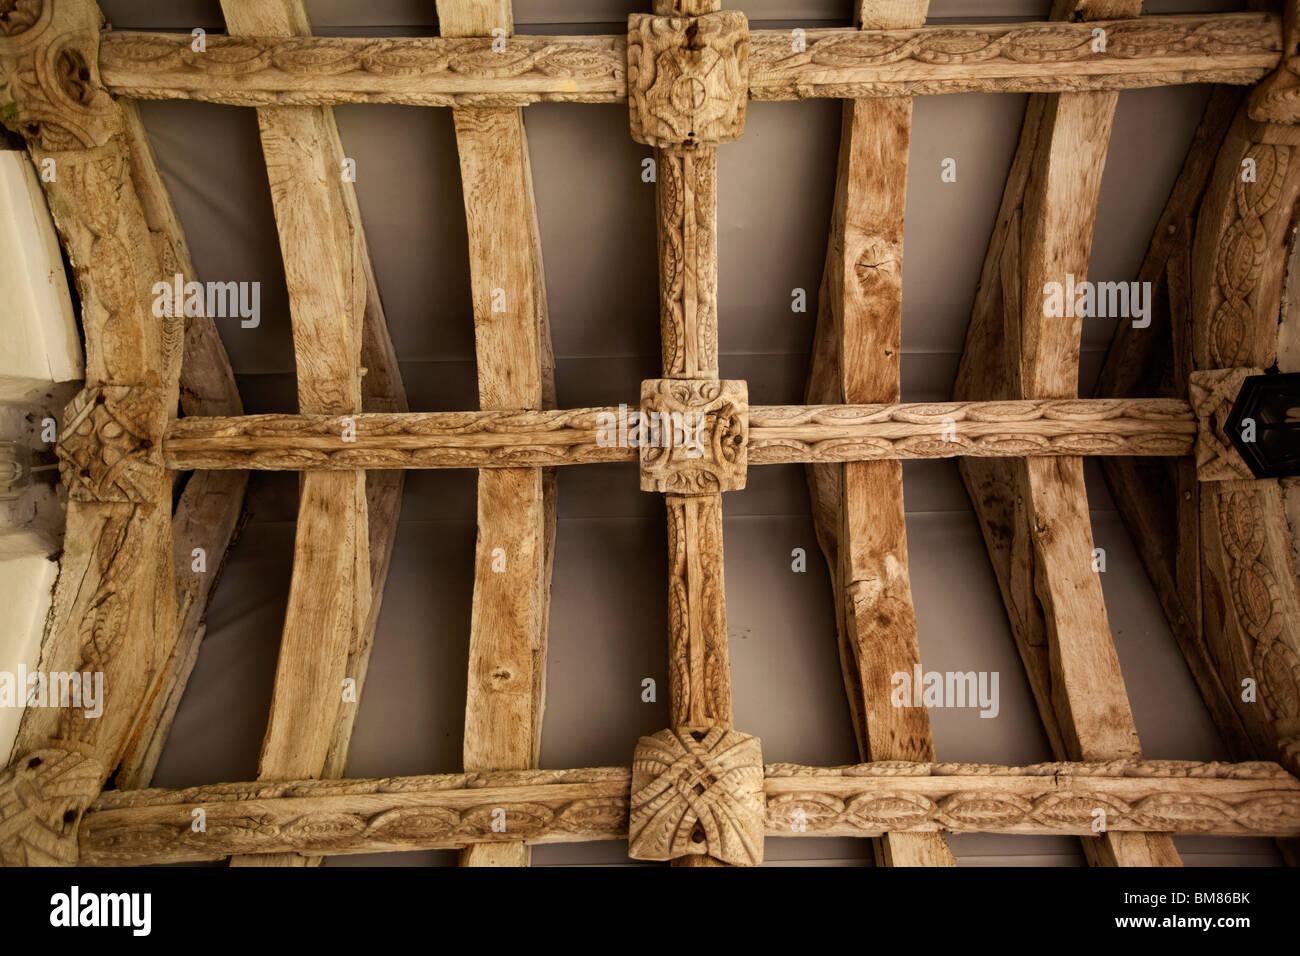 Reino Unido, Cornwall, Laneast, iglesia de St Sidwell y St Gulval, porche, el viejo roble estructura del techo Imagen De Stock